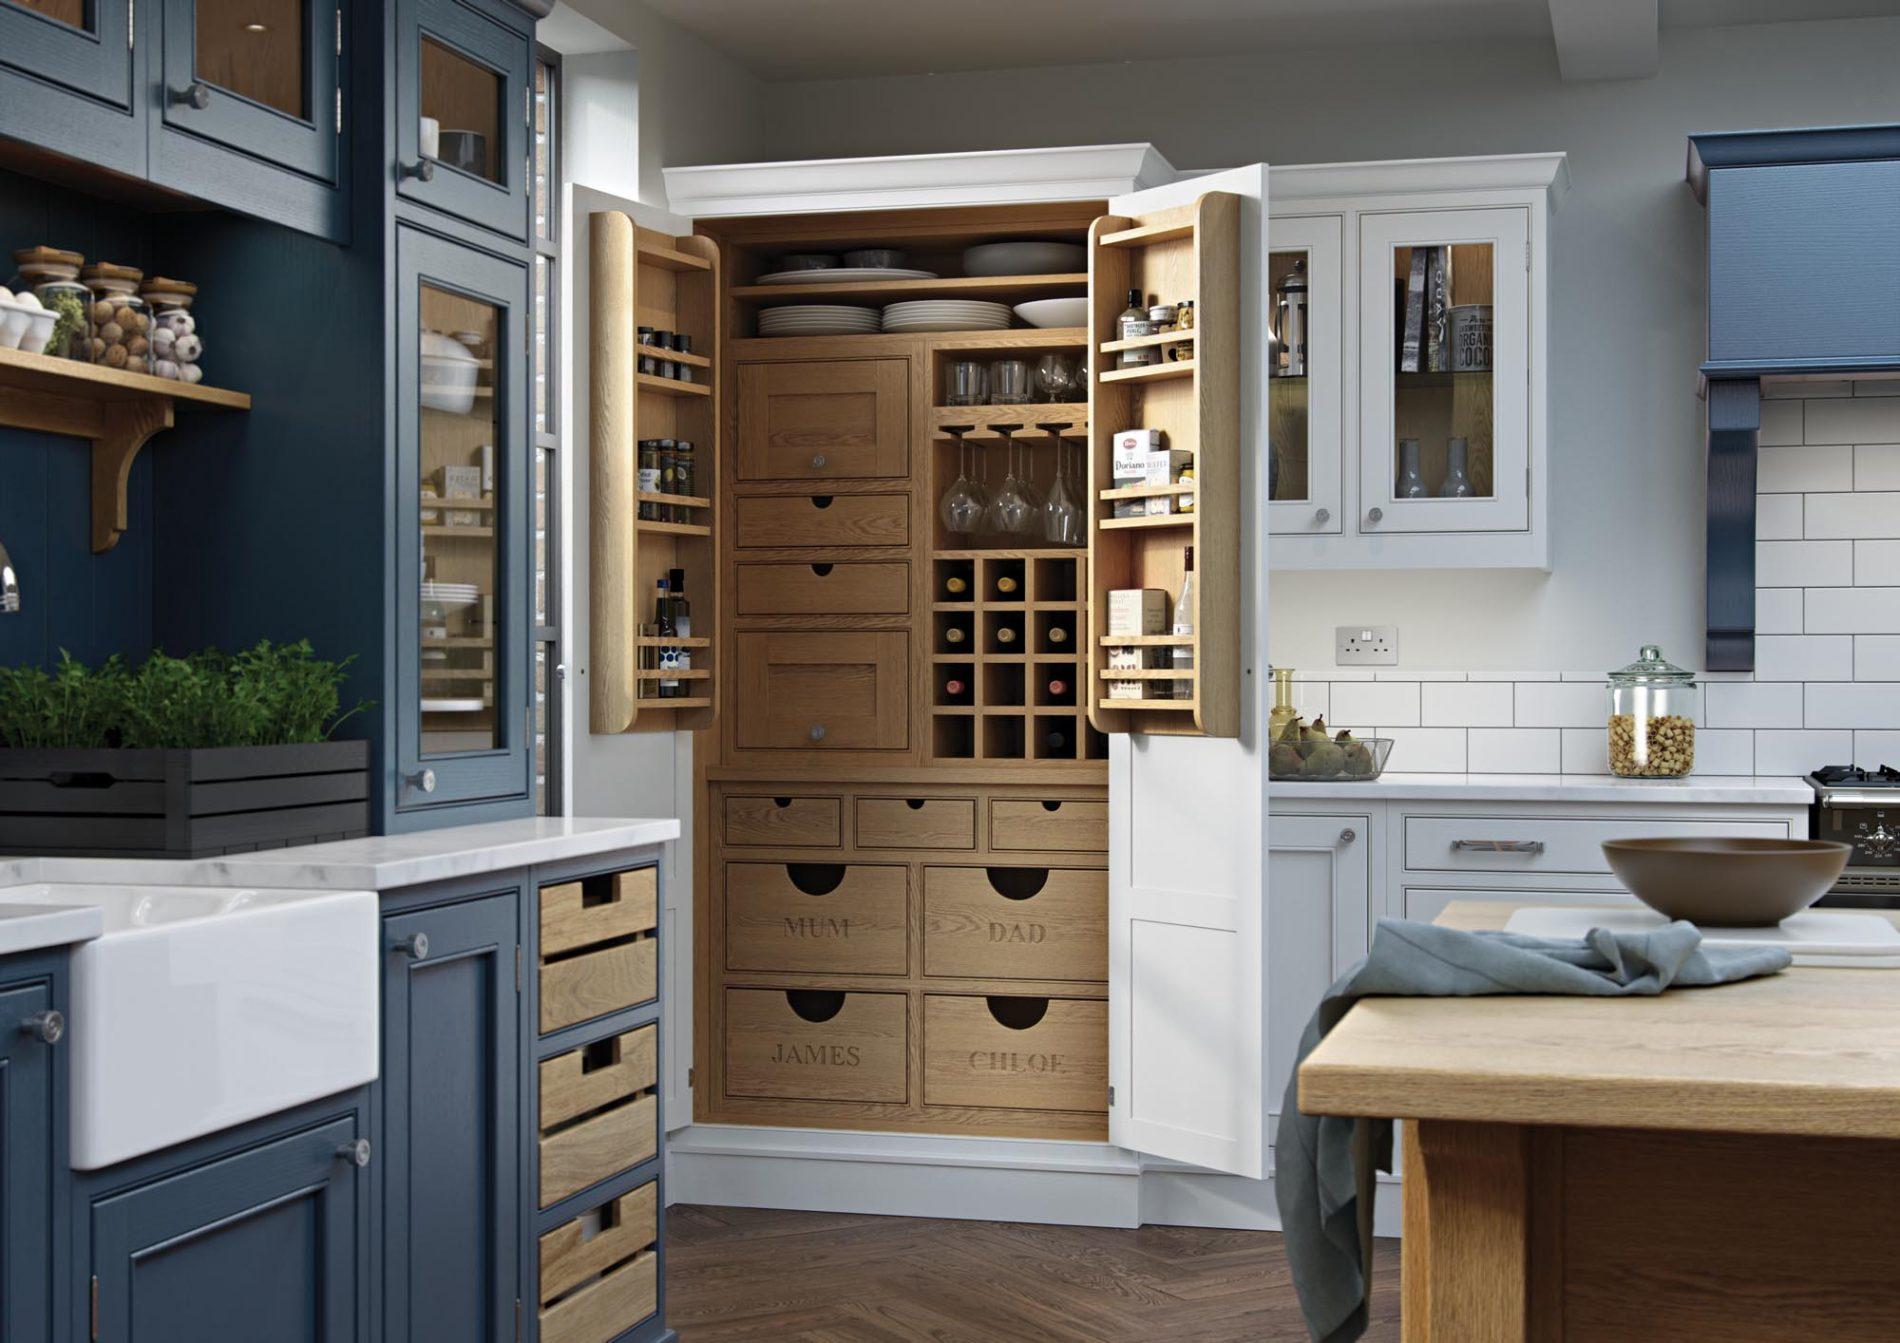 Crestwood of Lymington Kitchens